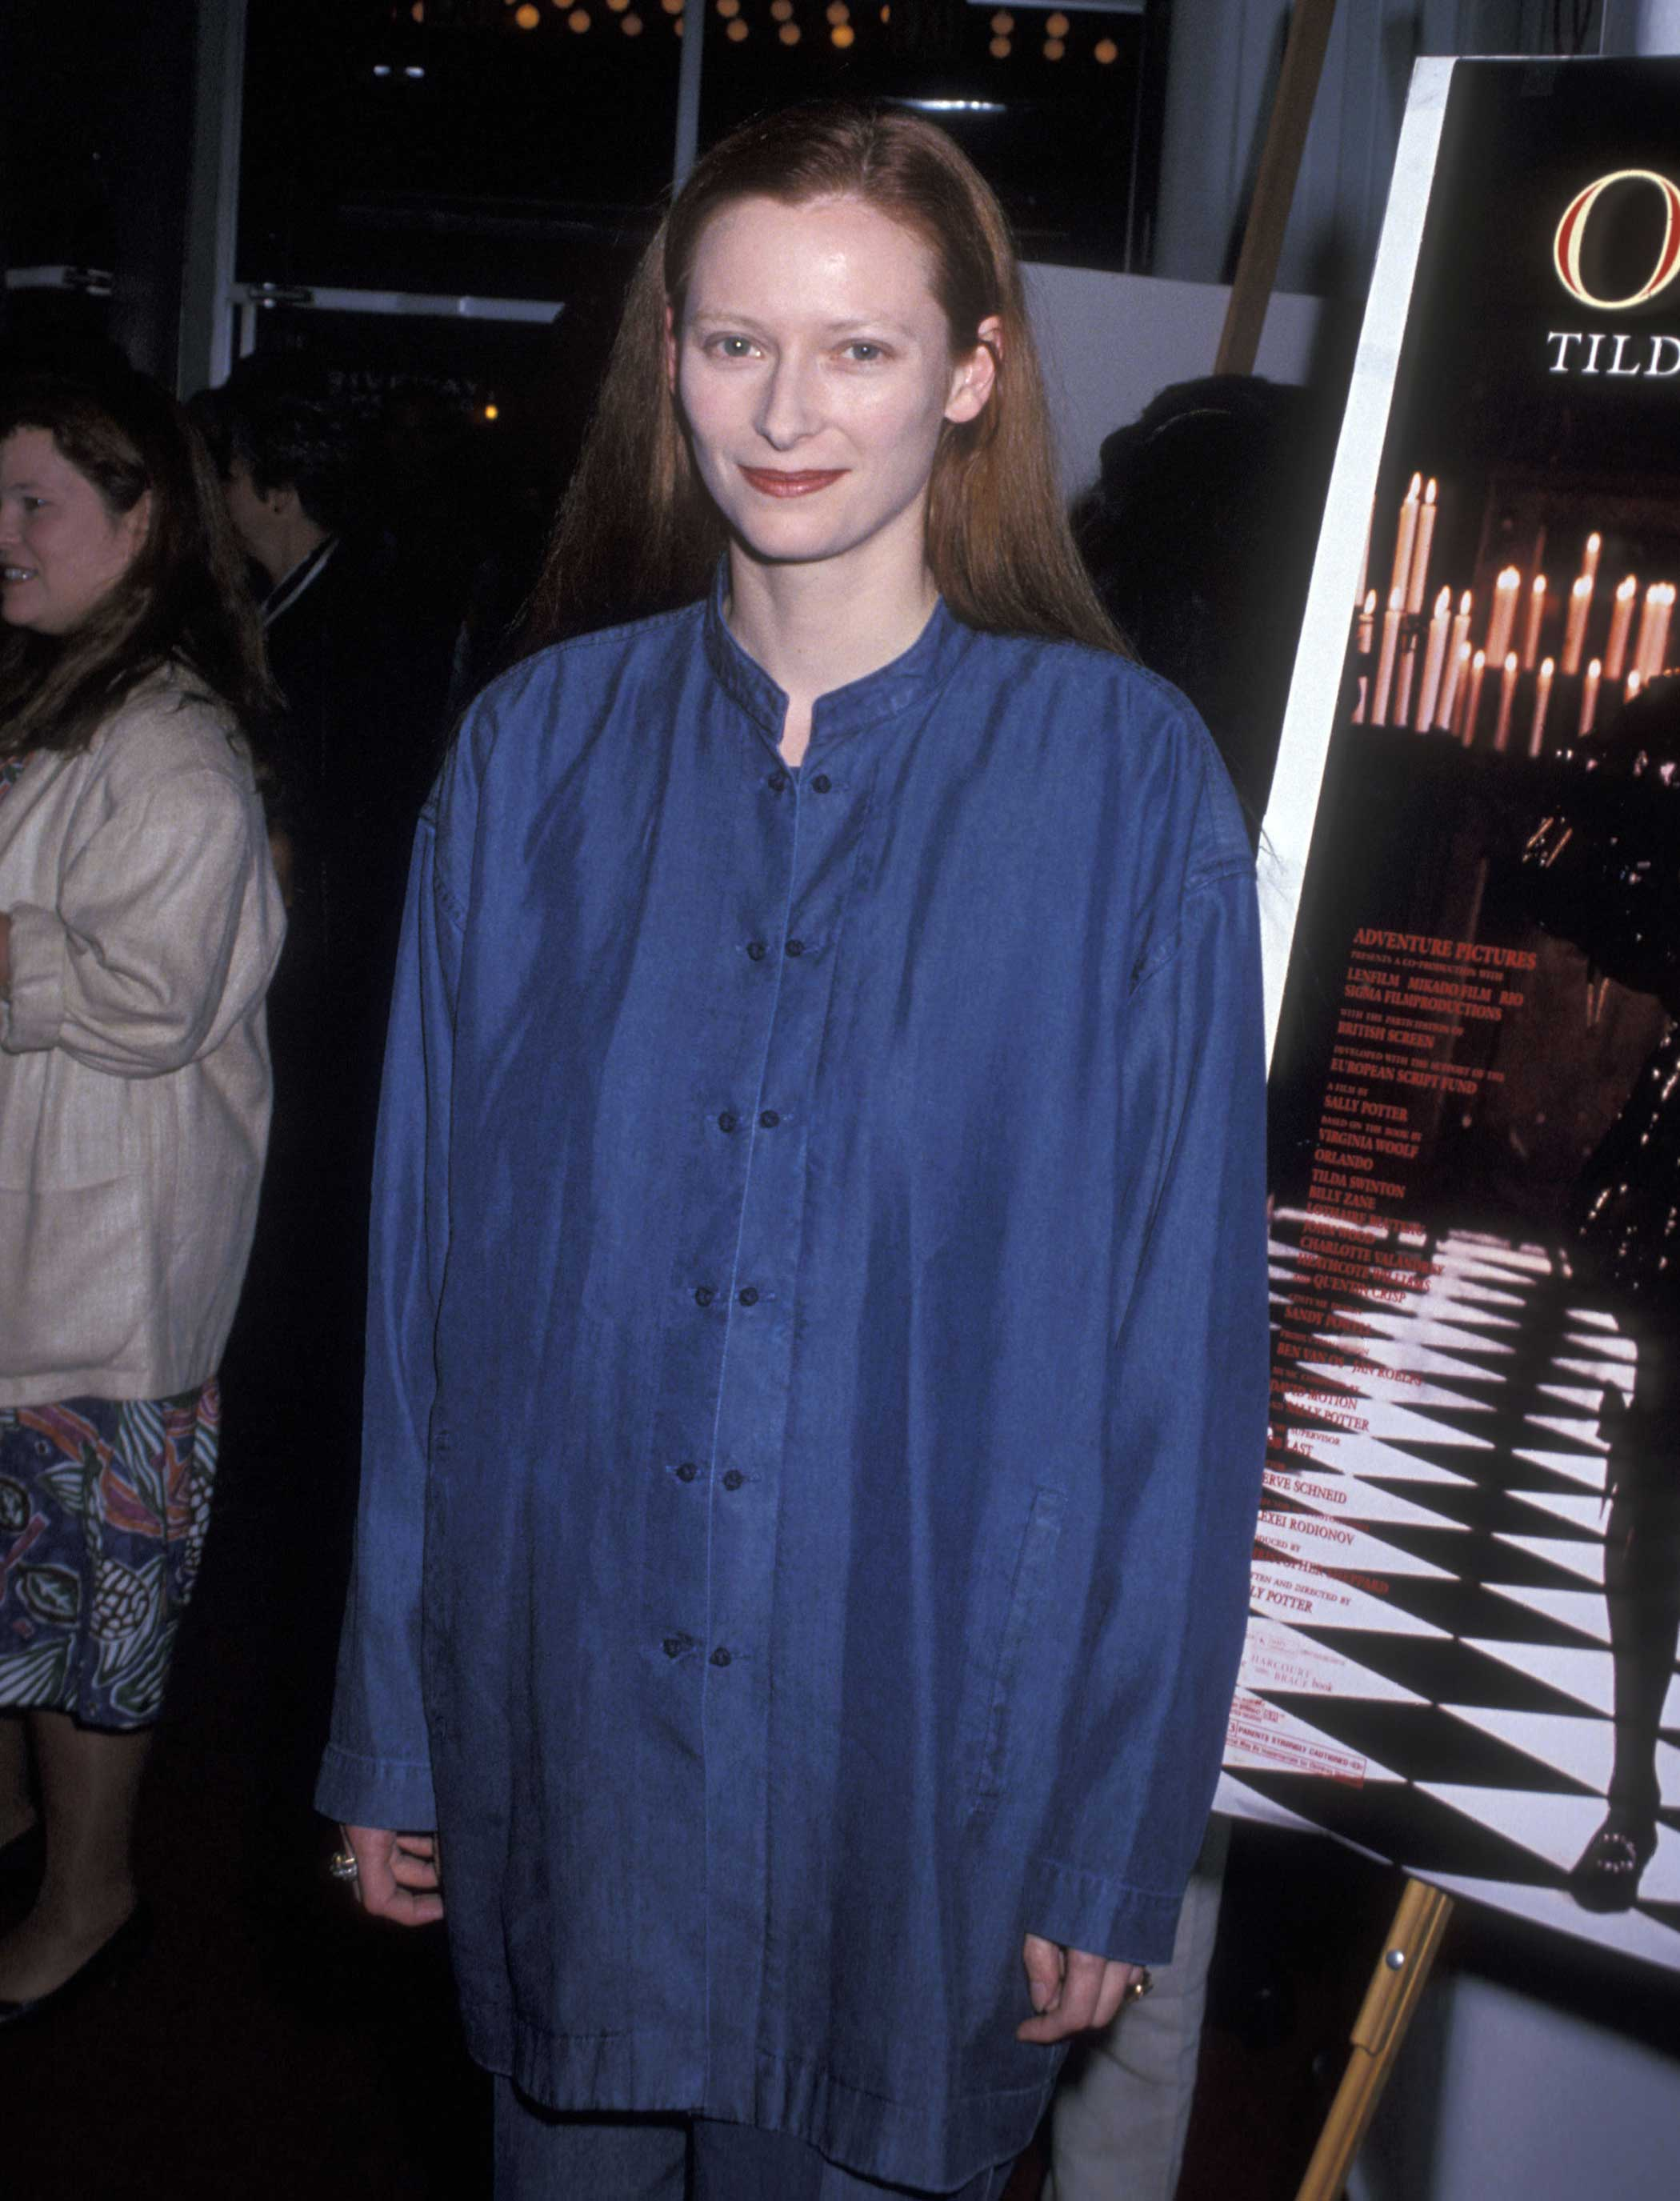 Tilda Swinton attends the Orlando New York City Premiere on June 2, 1993 in New York City.